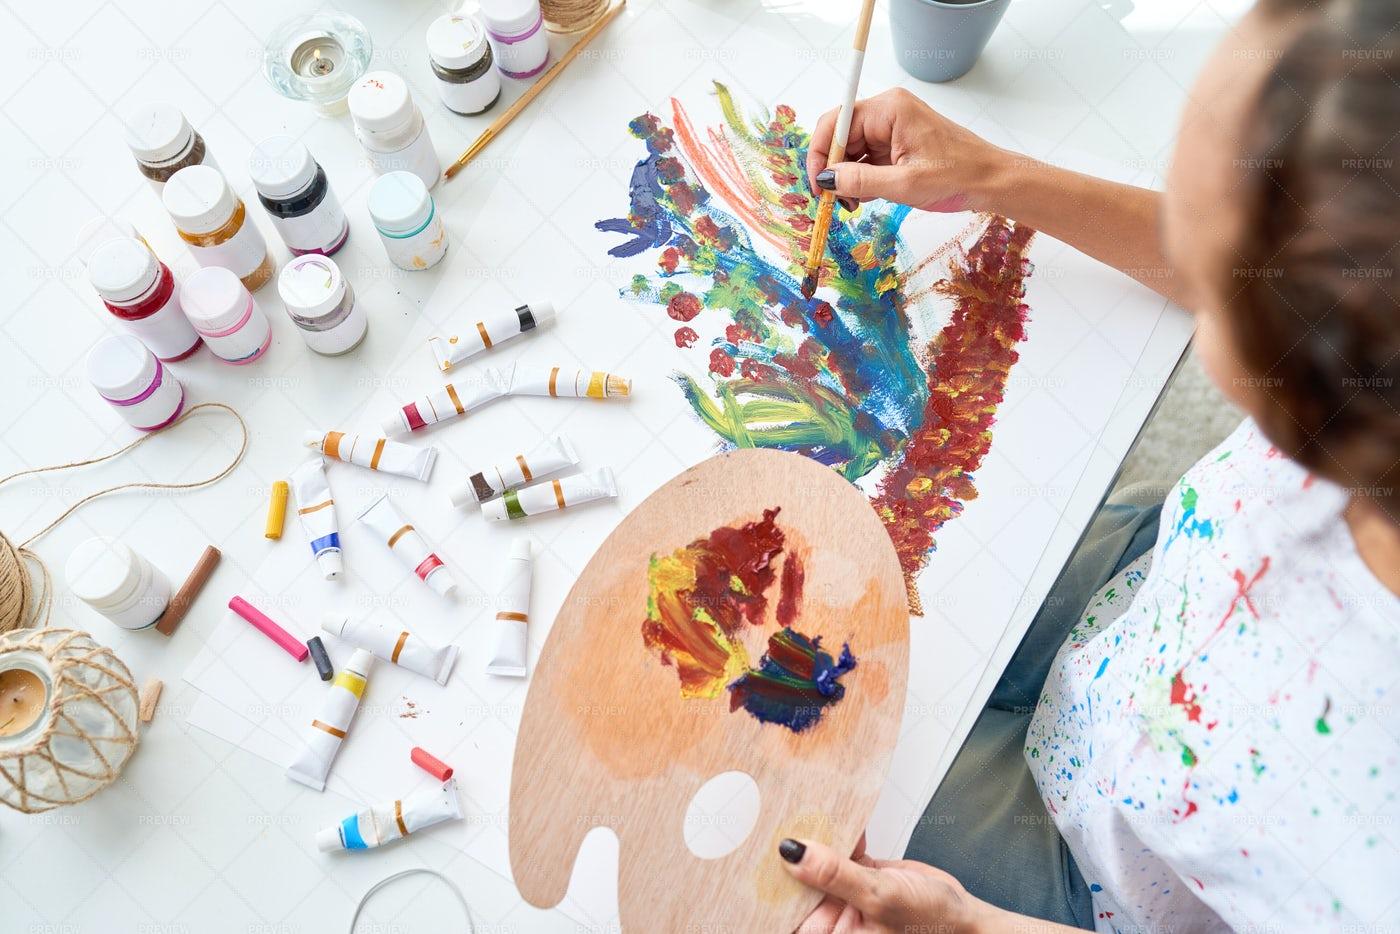 Artist Painting Flowers: Stock Photos